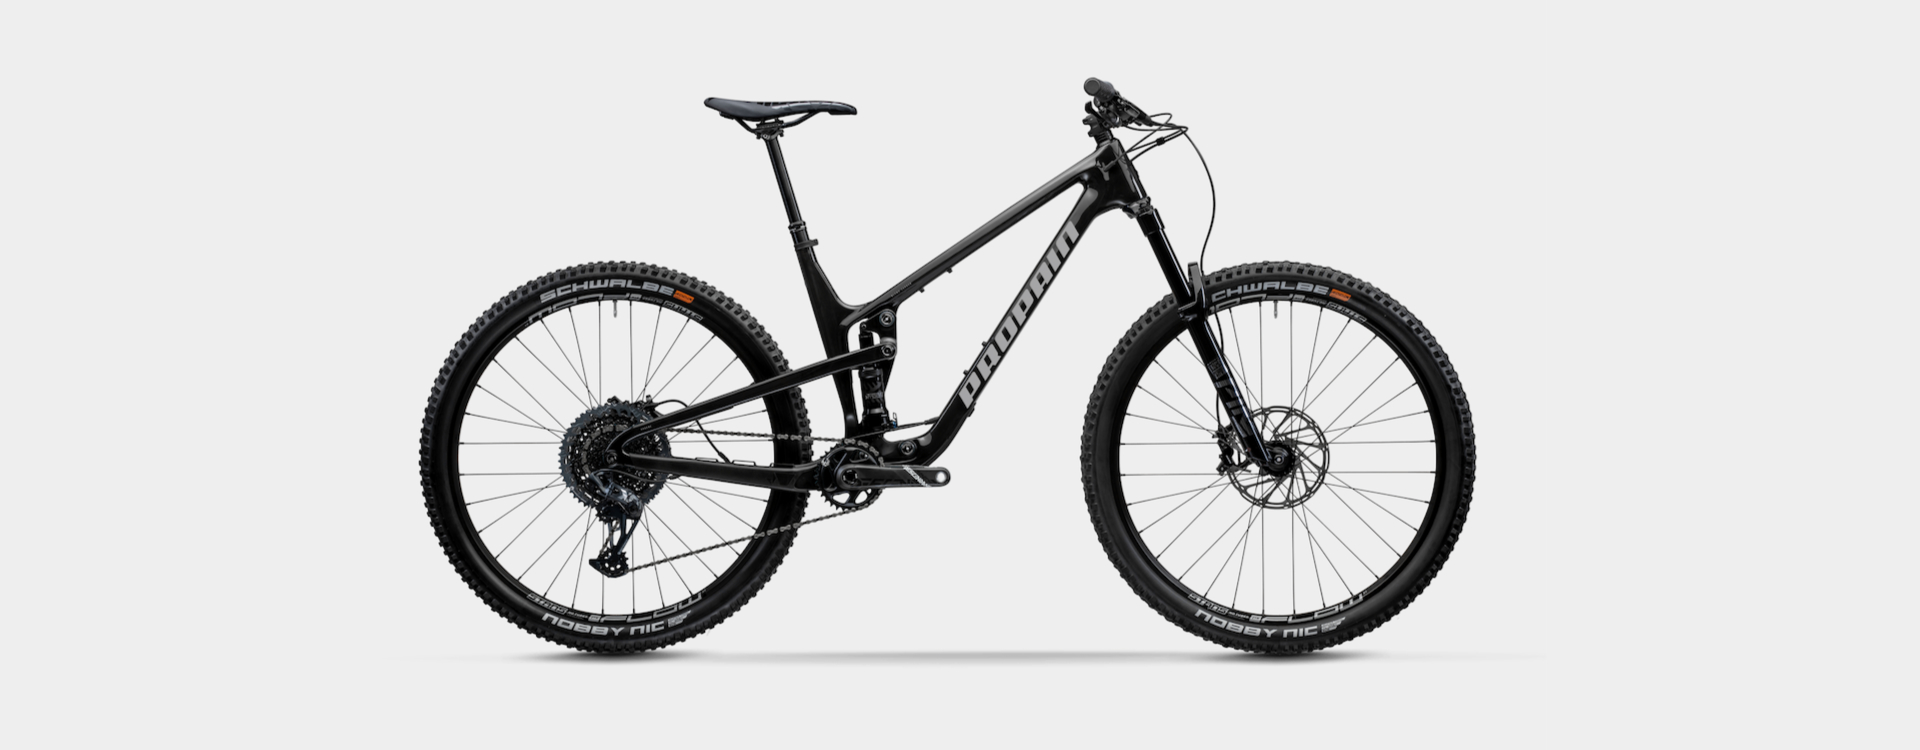 Bike Verleih Bad Salzdetfurth Propain Bikes Testcenter Niedersachsen Hugene 5 - CF - XL - Raw - 1920x750px